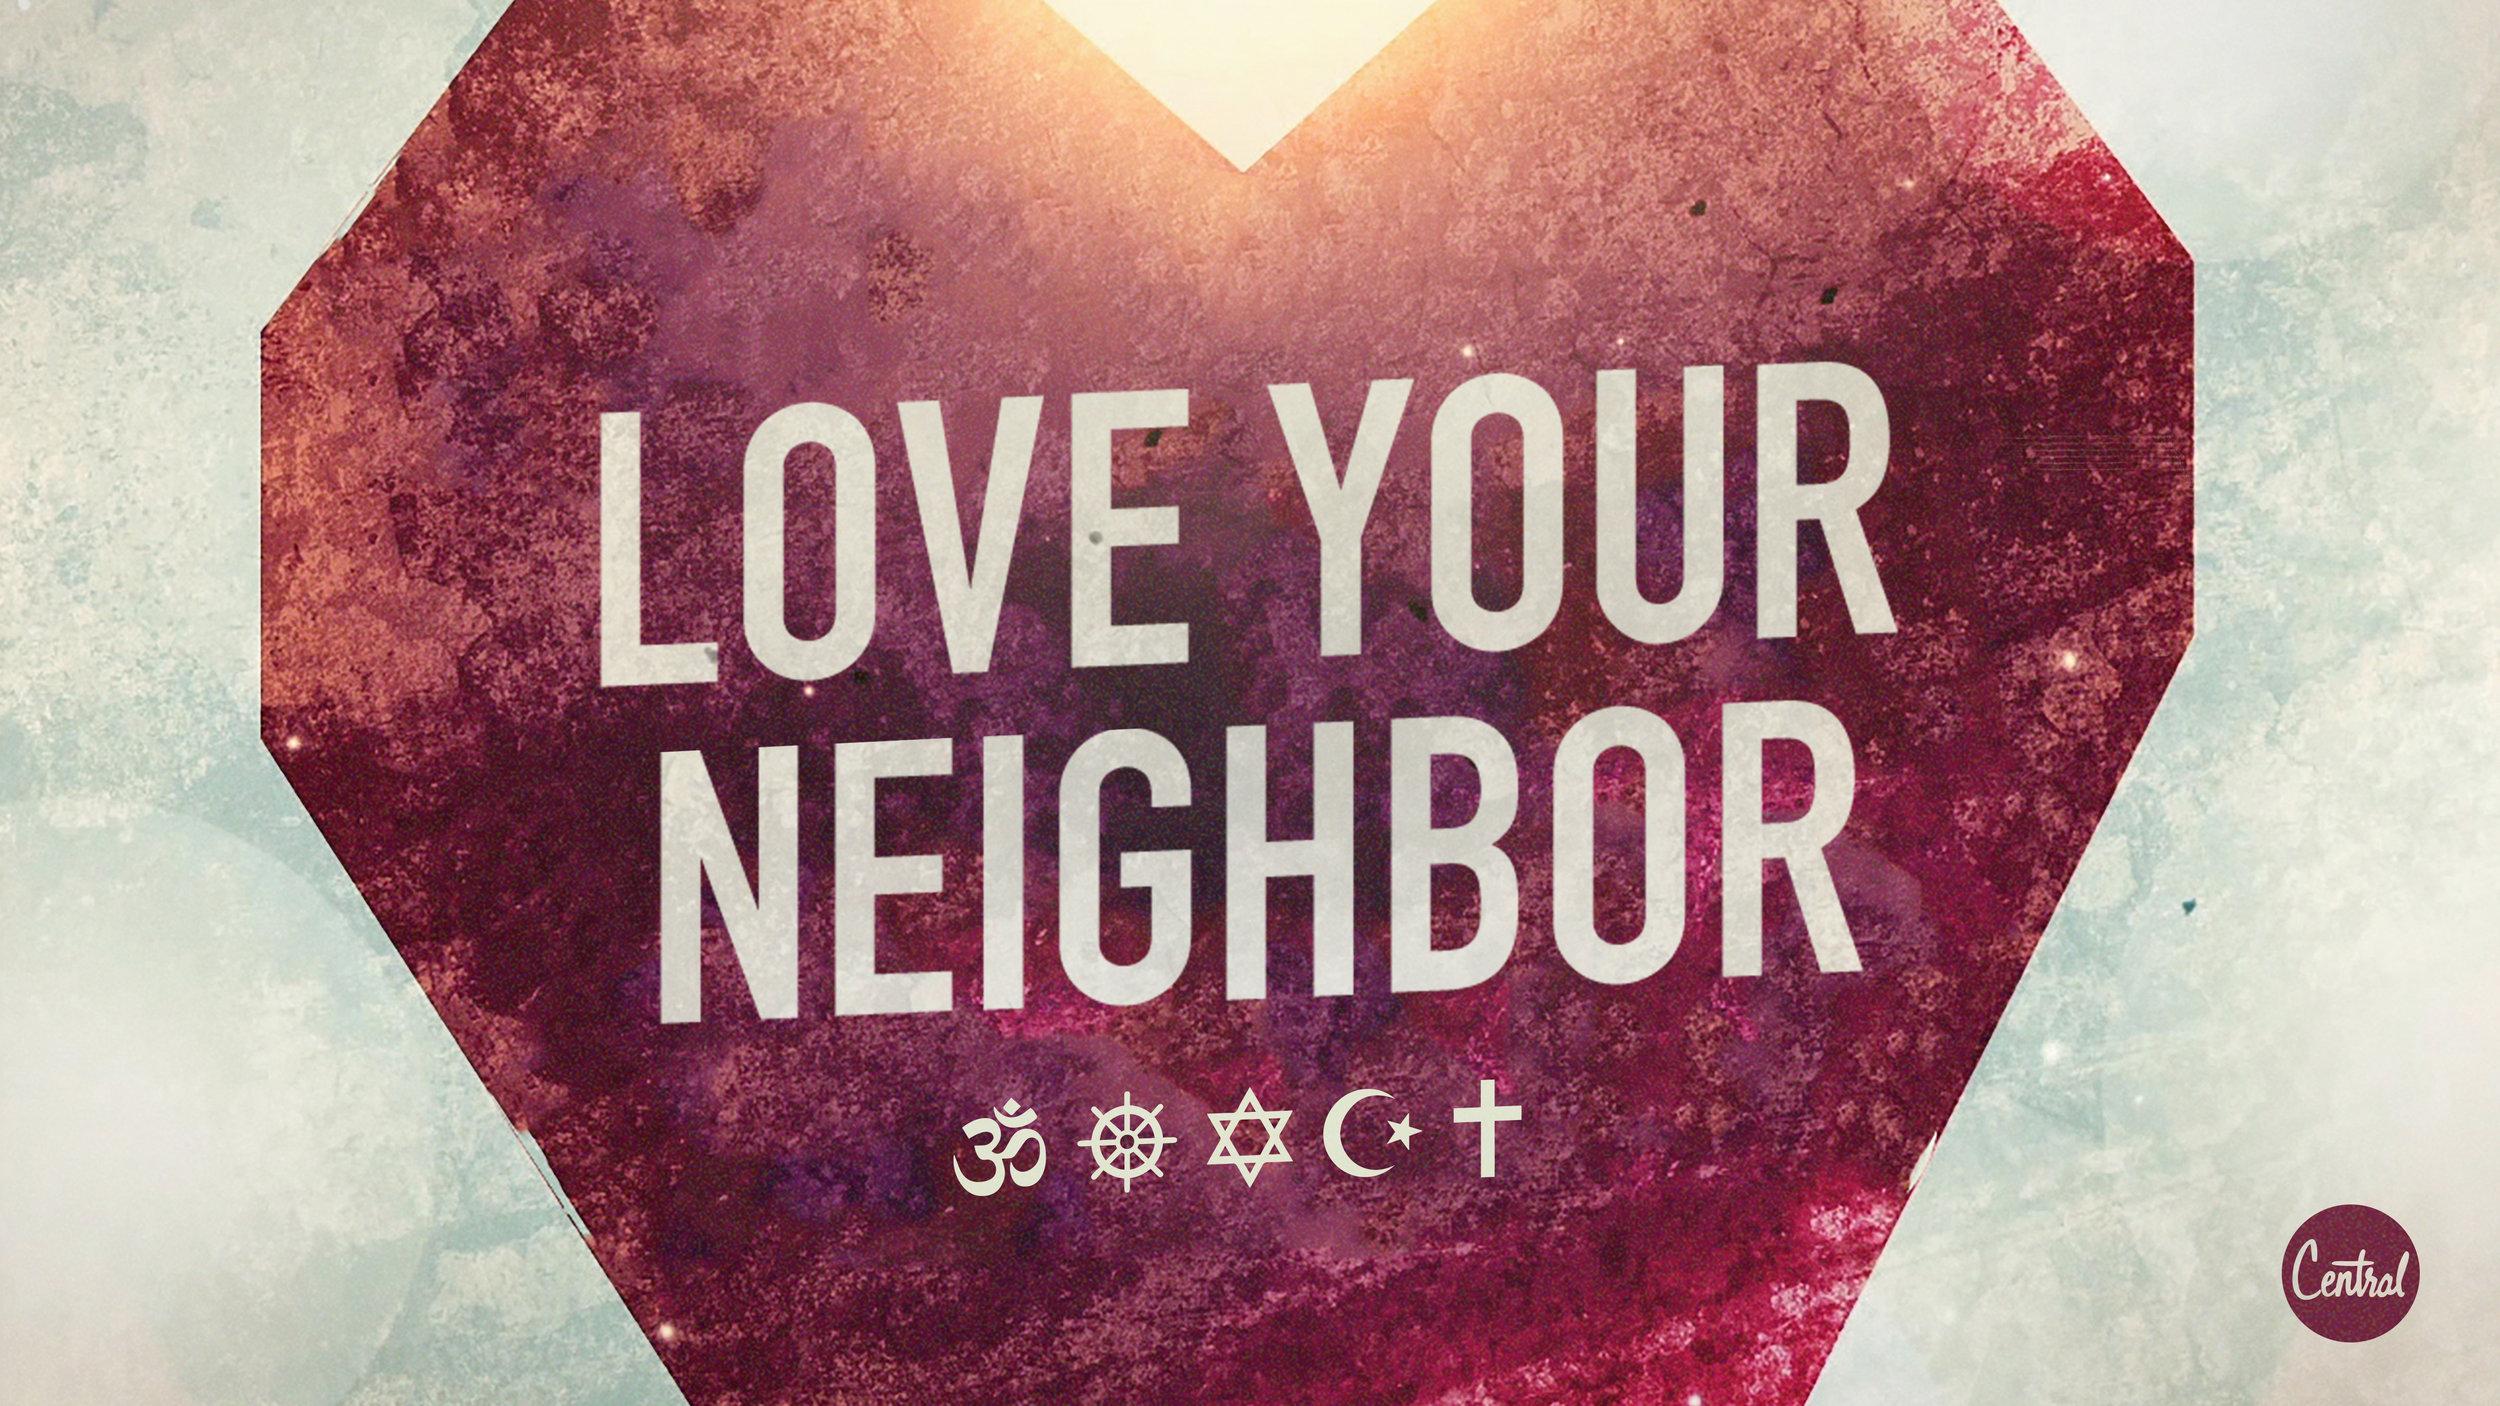 LoveYourNeighbor-Title-FA.jpg